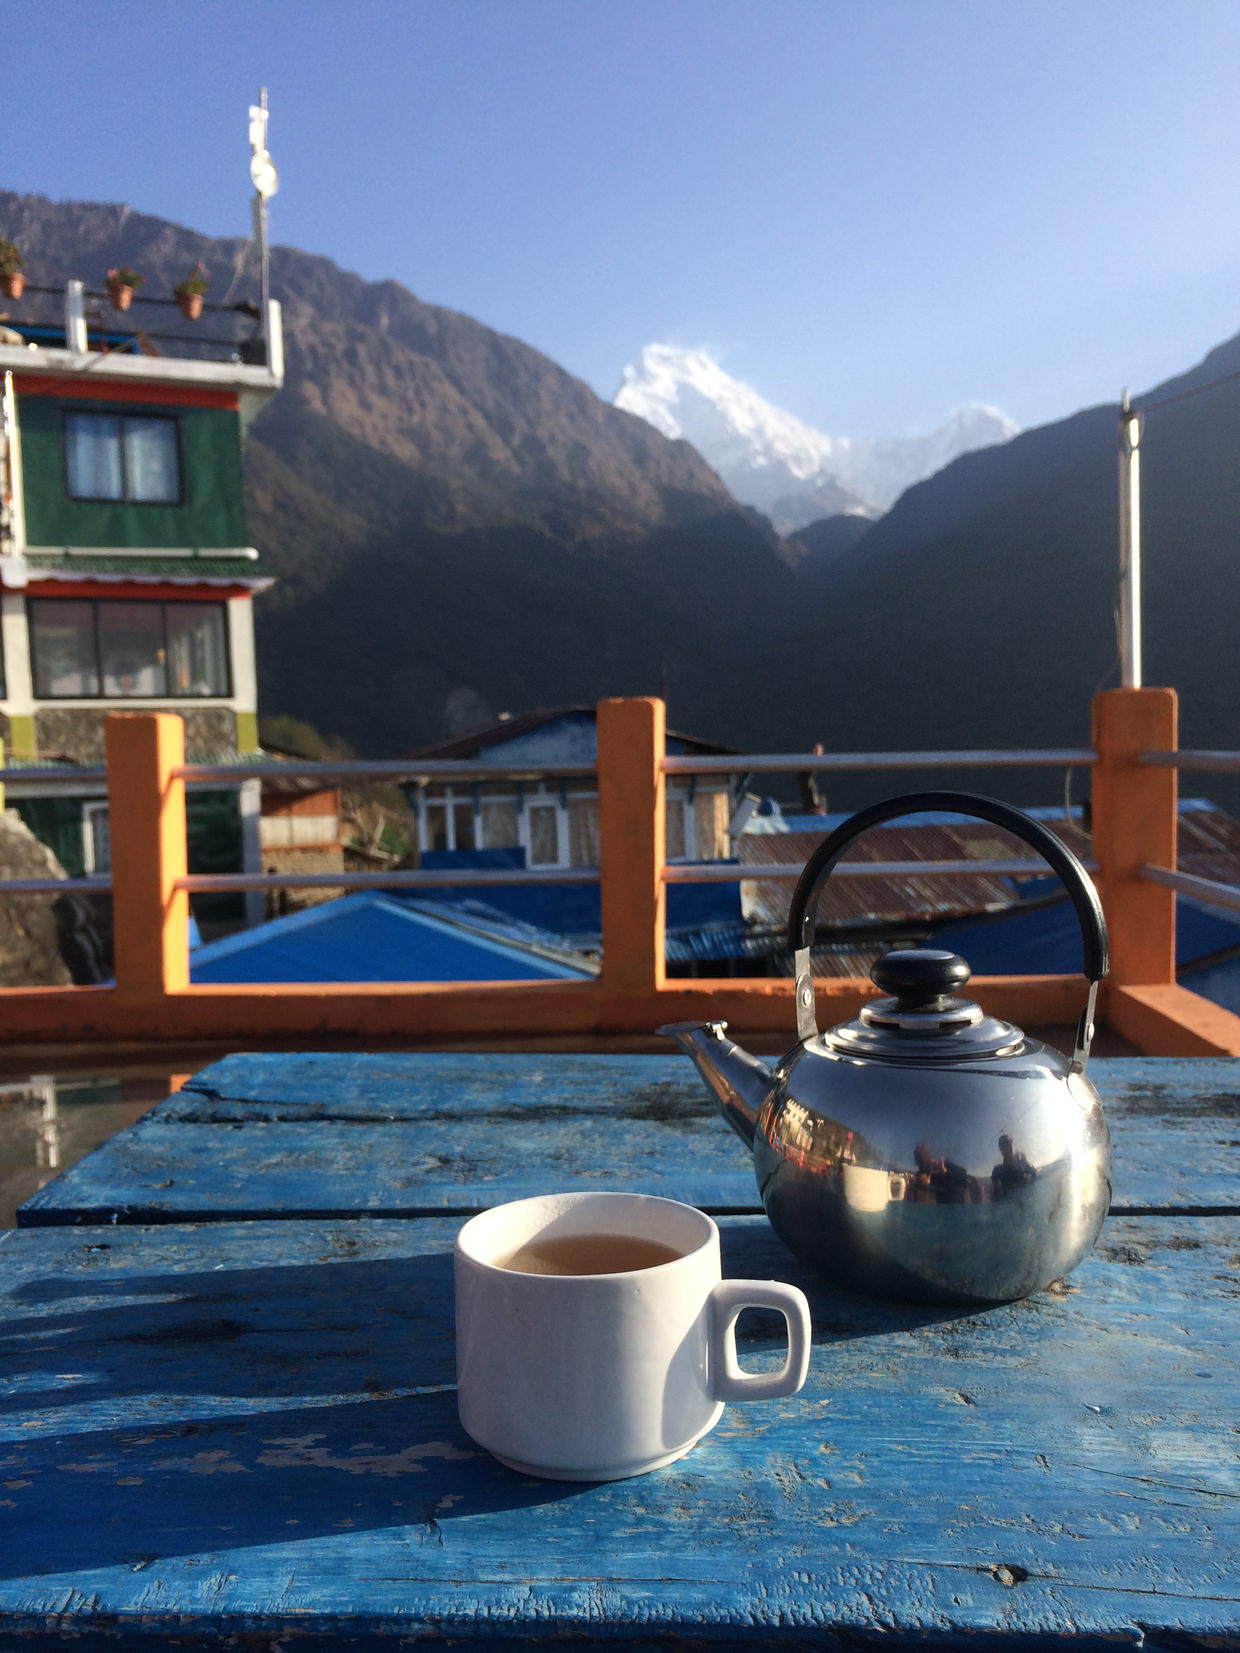 Tea and mountains